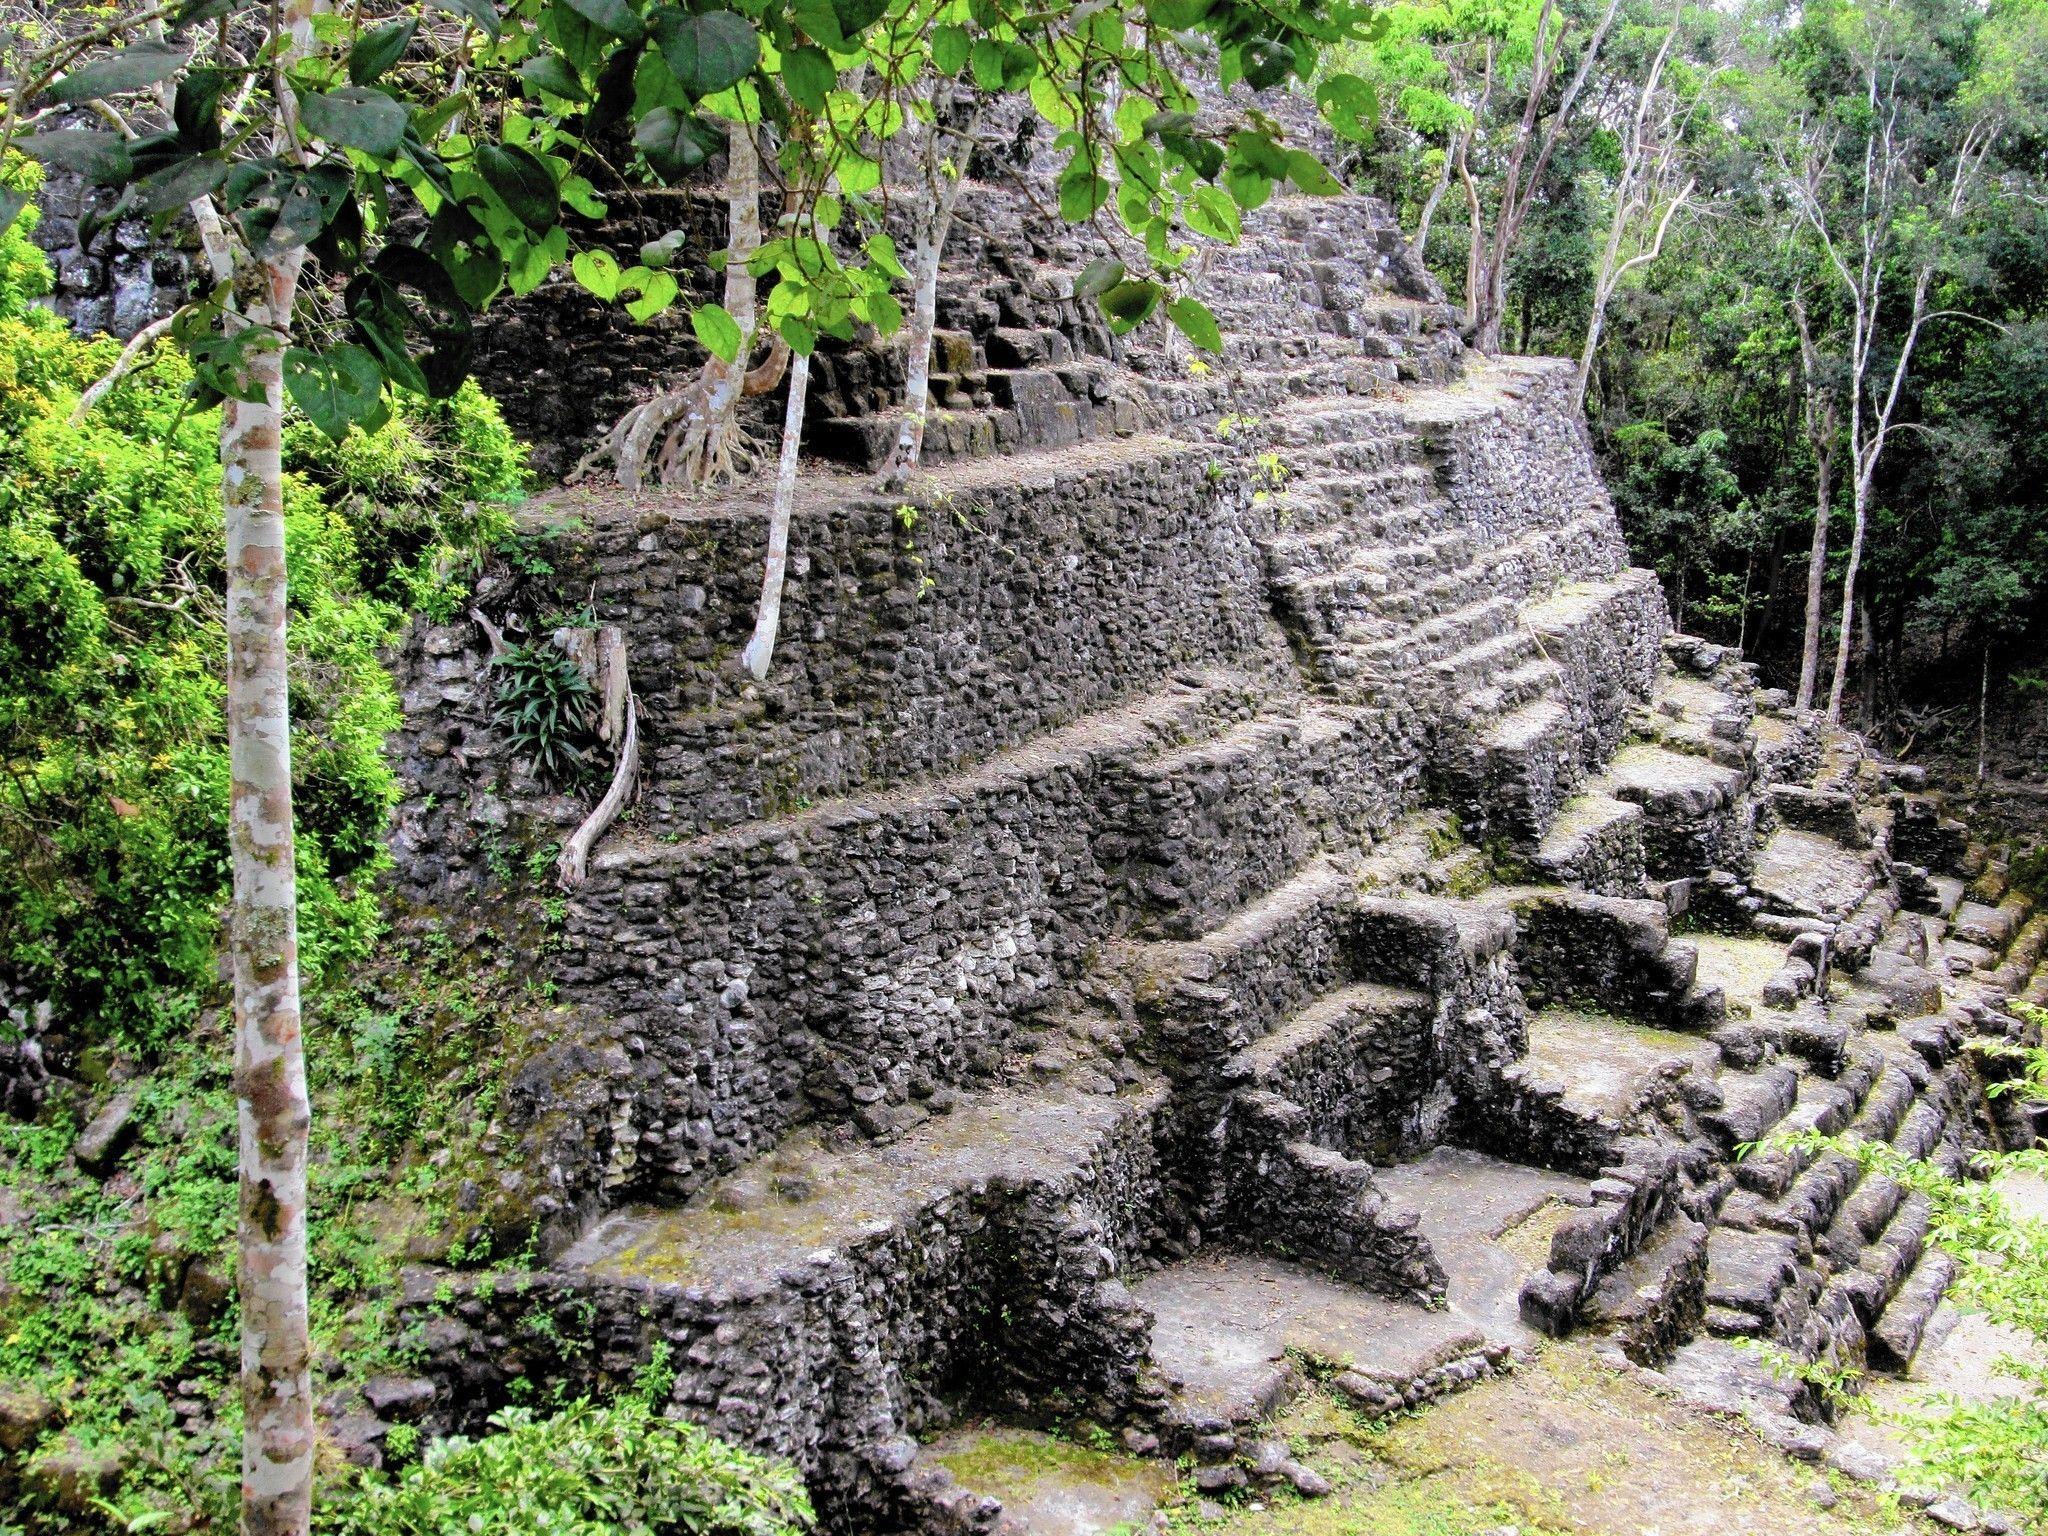 El Mirador's Maya marvels await discovery in the Guatemalan jungle